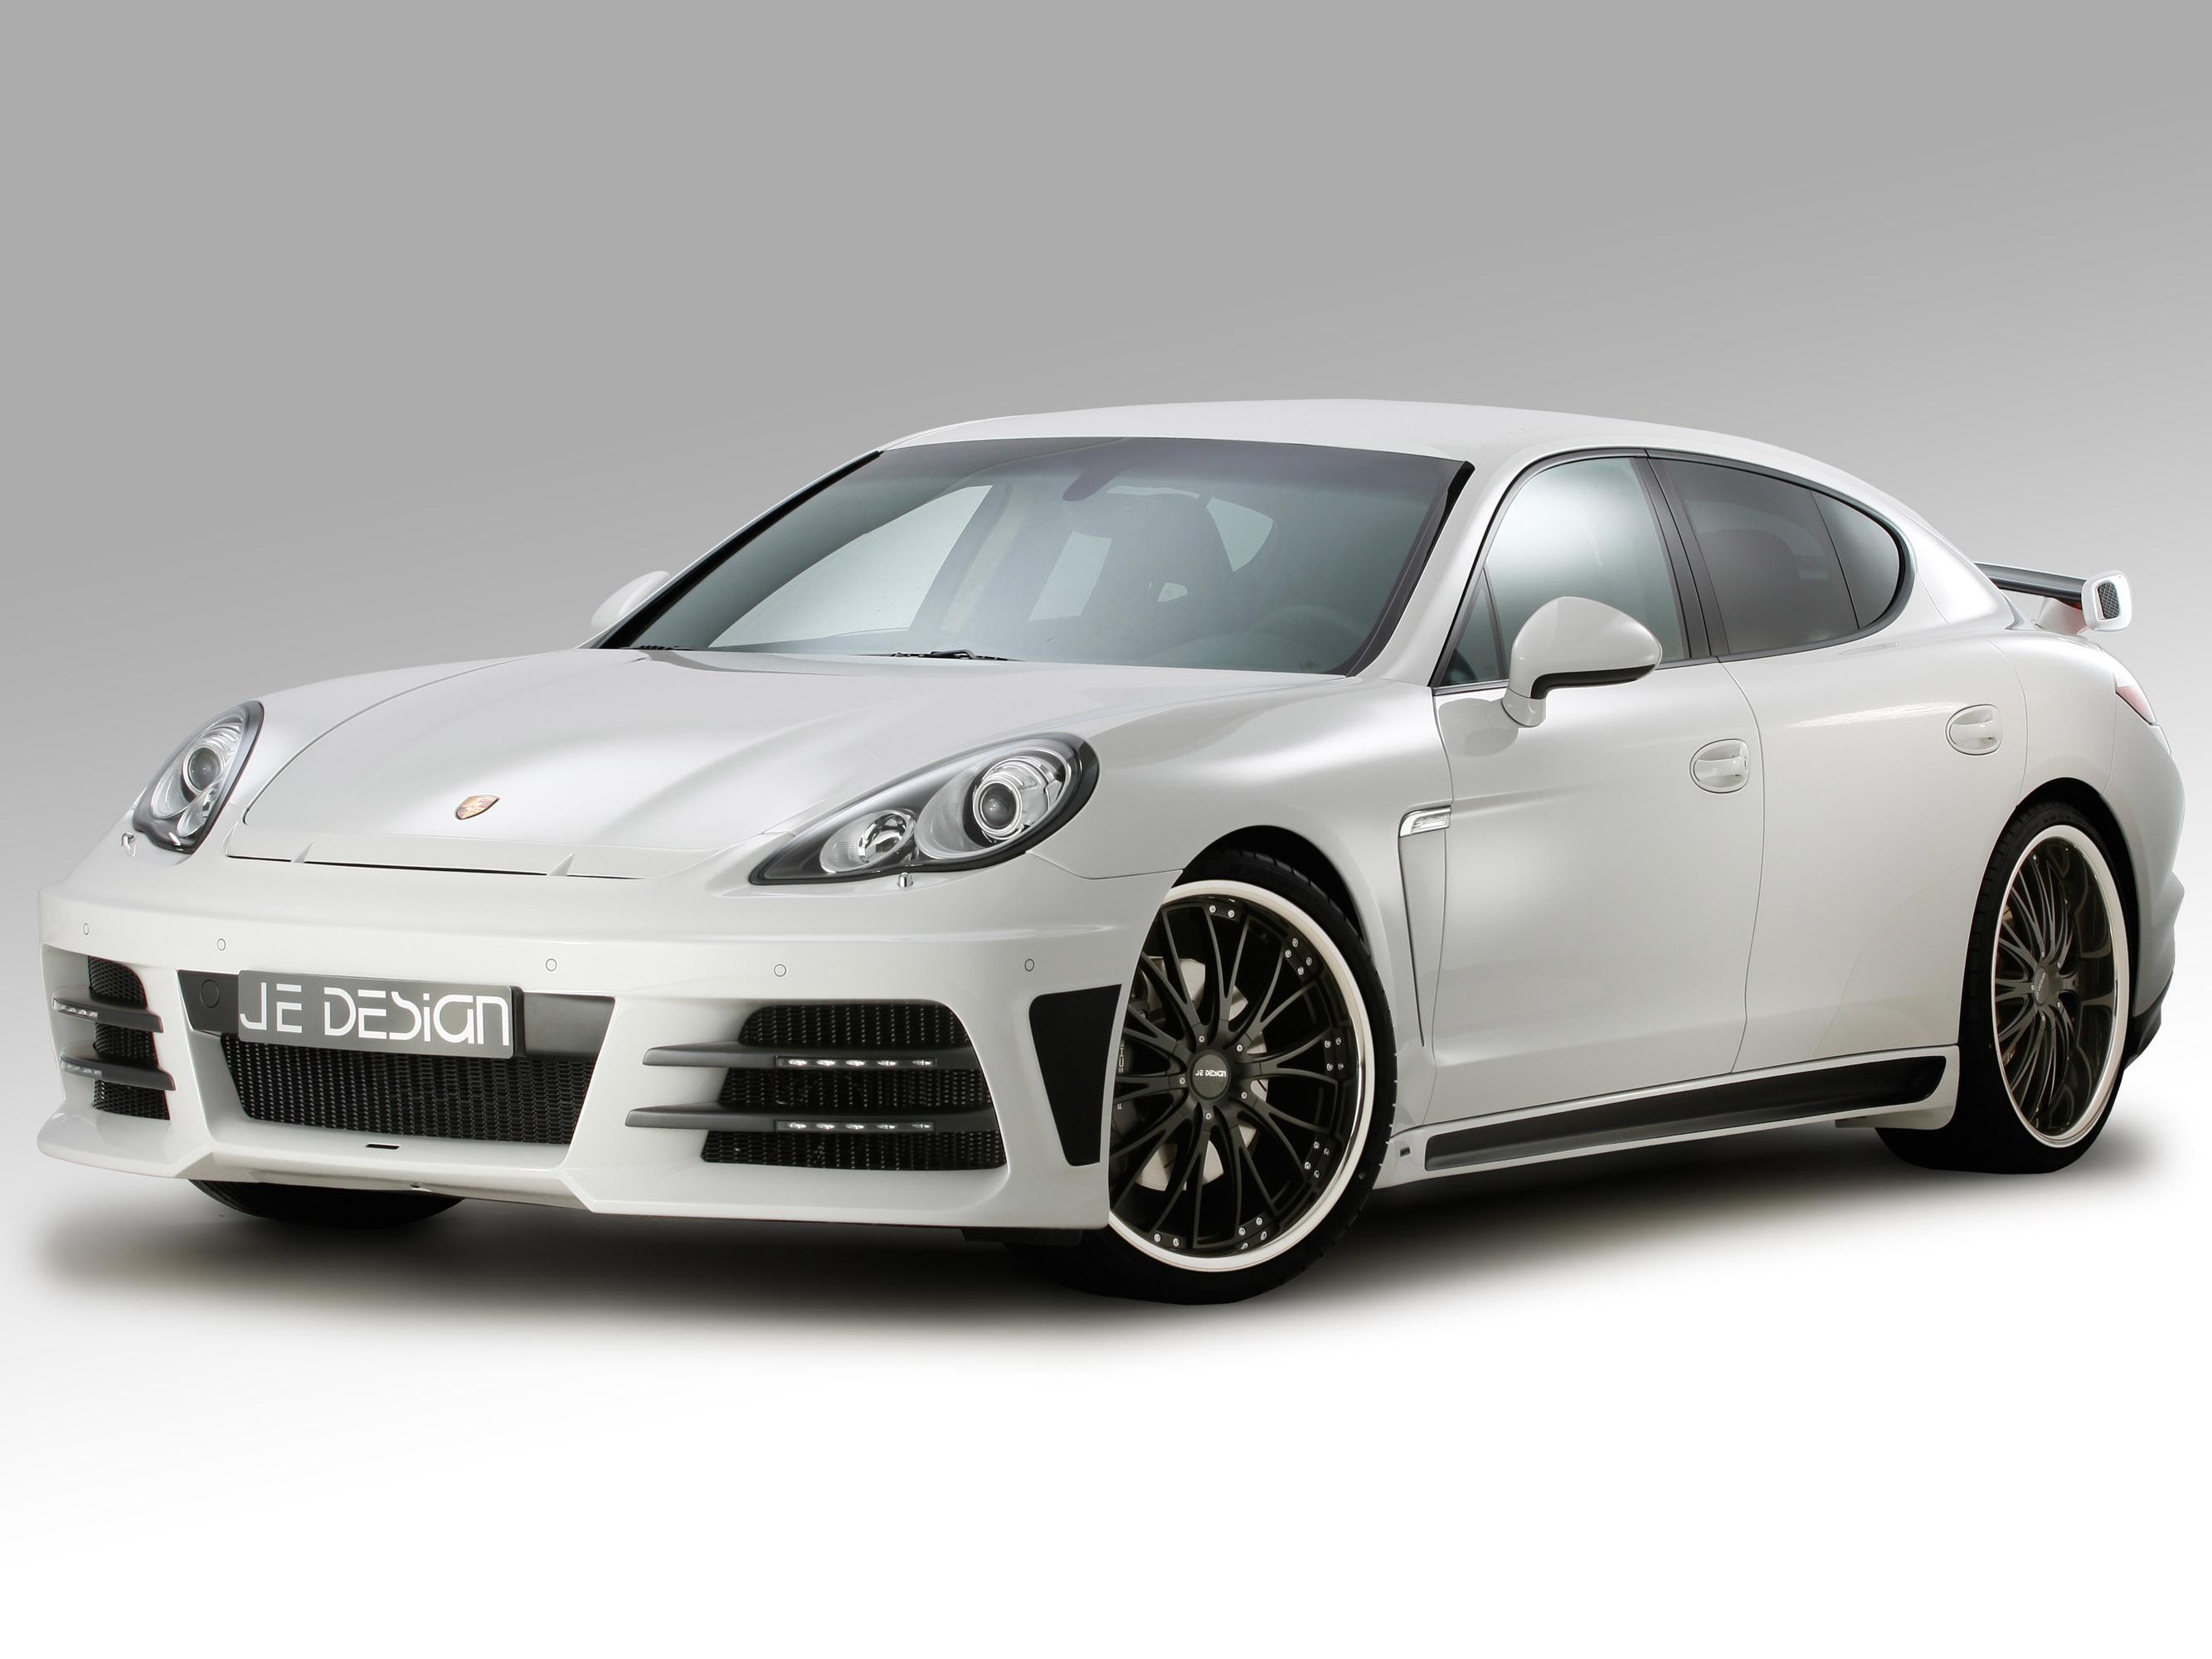 Je design porsche panamera 970 - Porsche panamera 5 portes ...